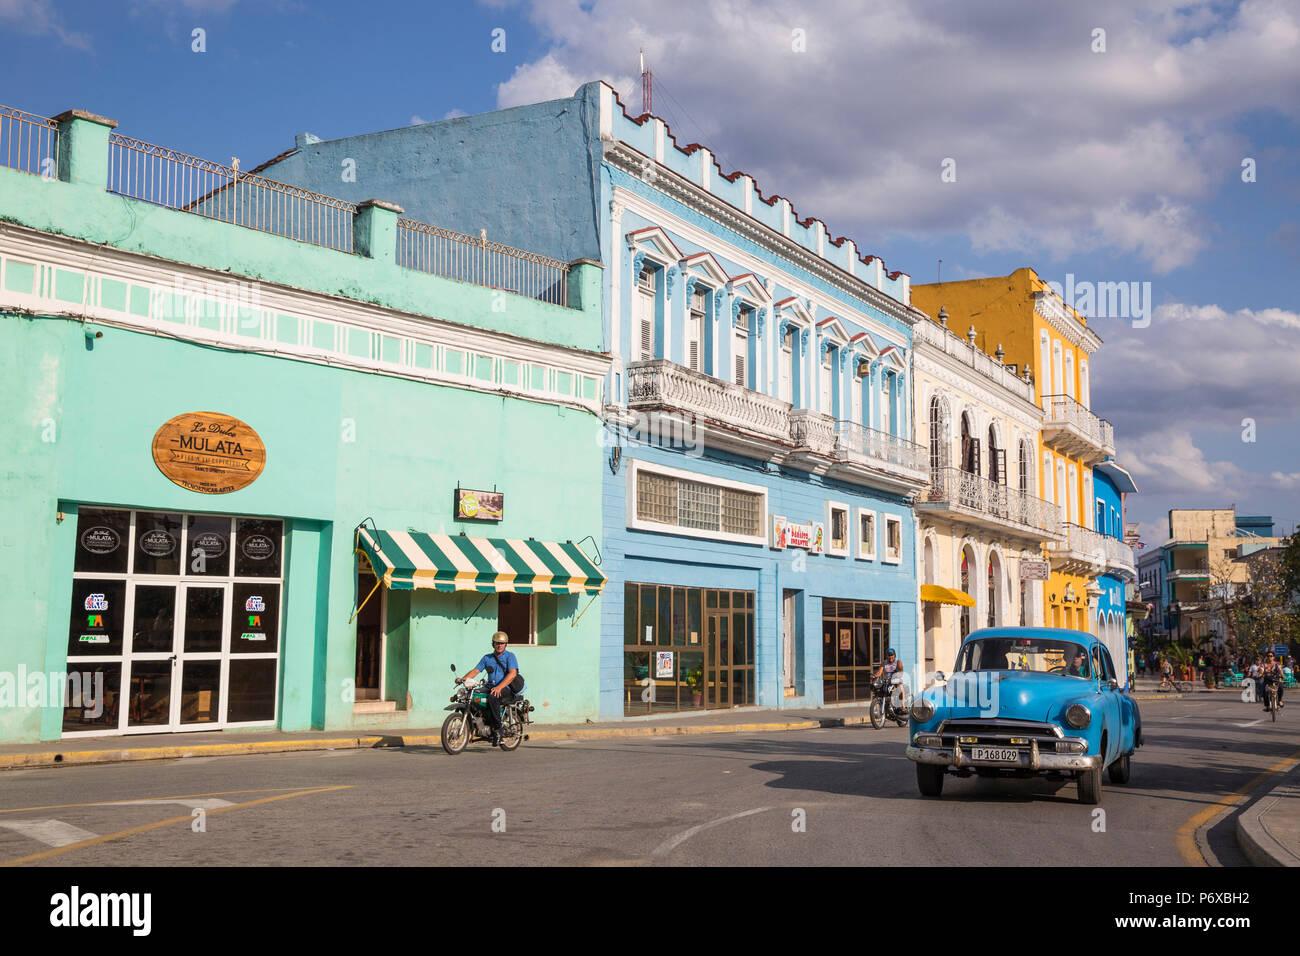 Kuba, Sancti Spiritus, Sancti Spiritus, Gebäude säumen Parque Serafin Sanchez, (Hauptplatz) Stockbild